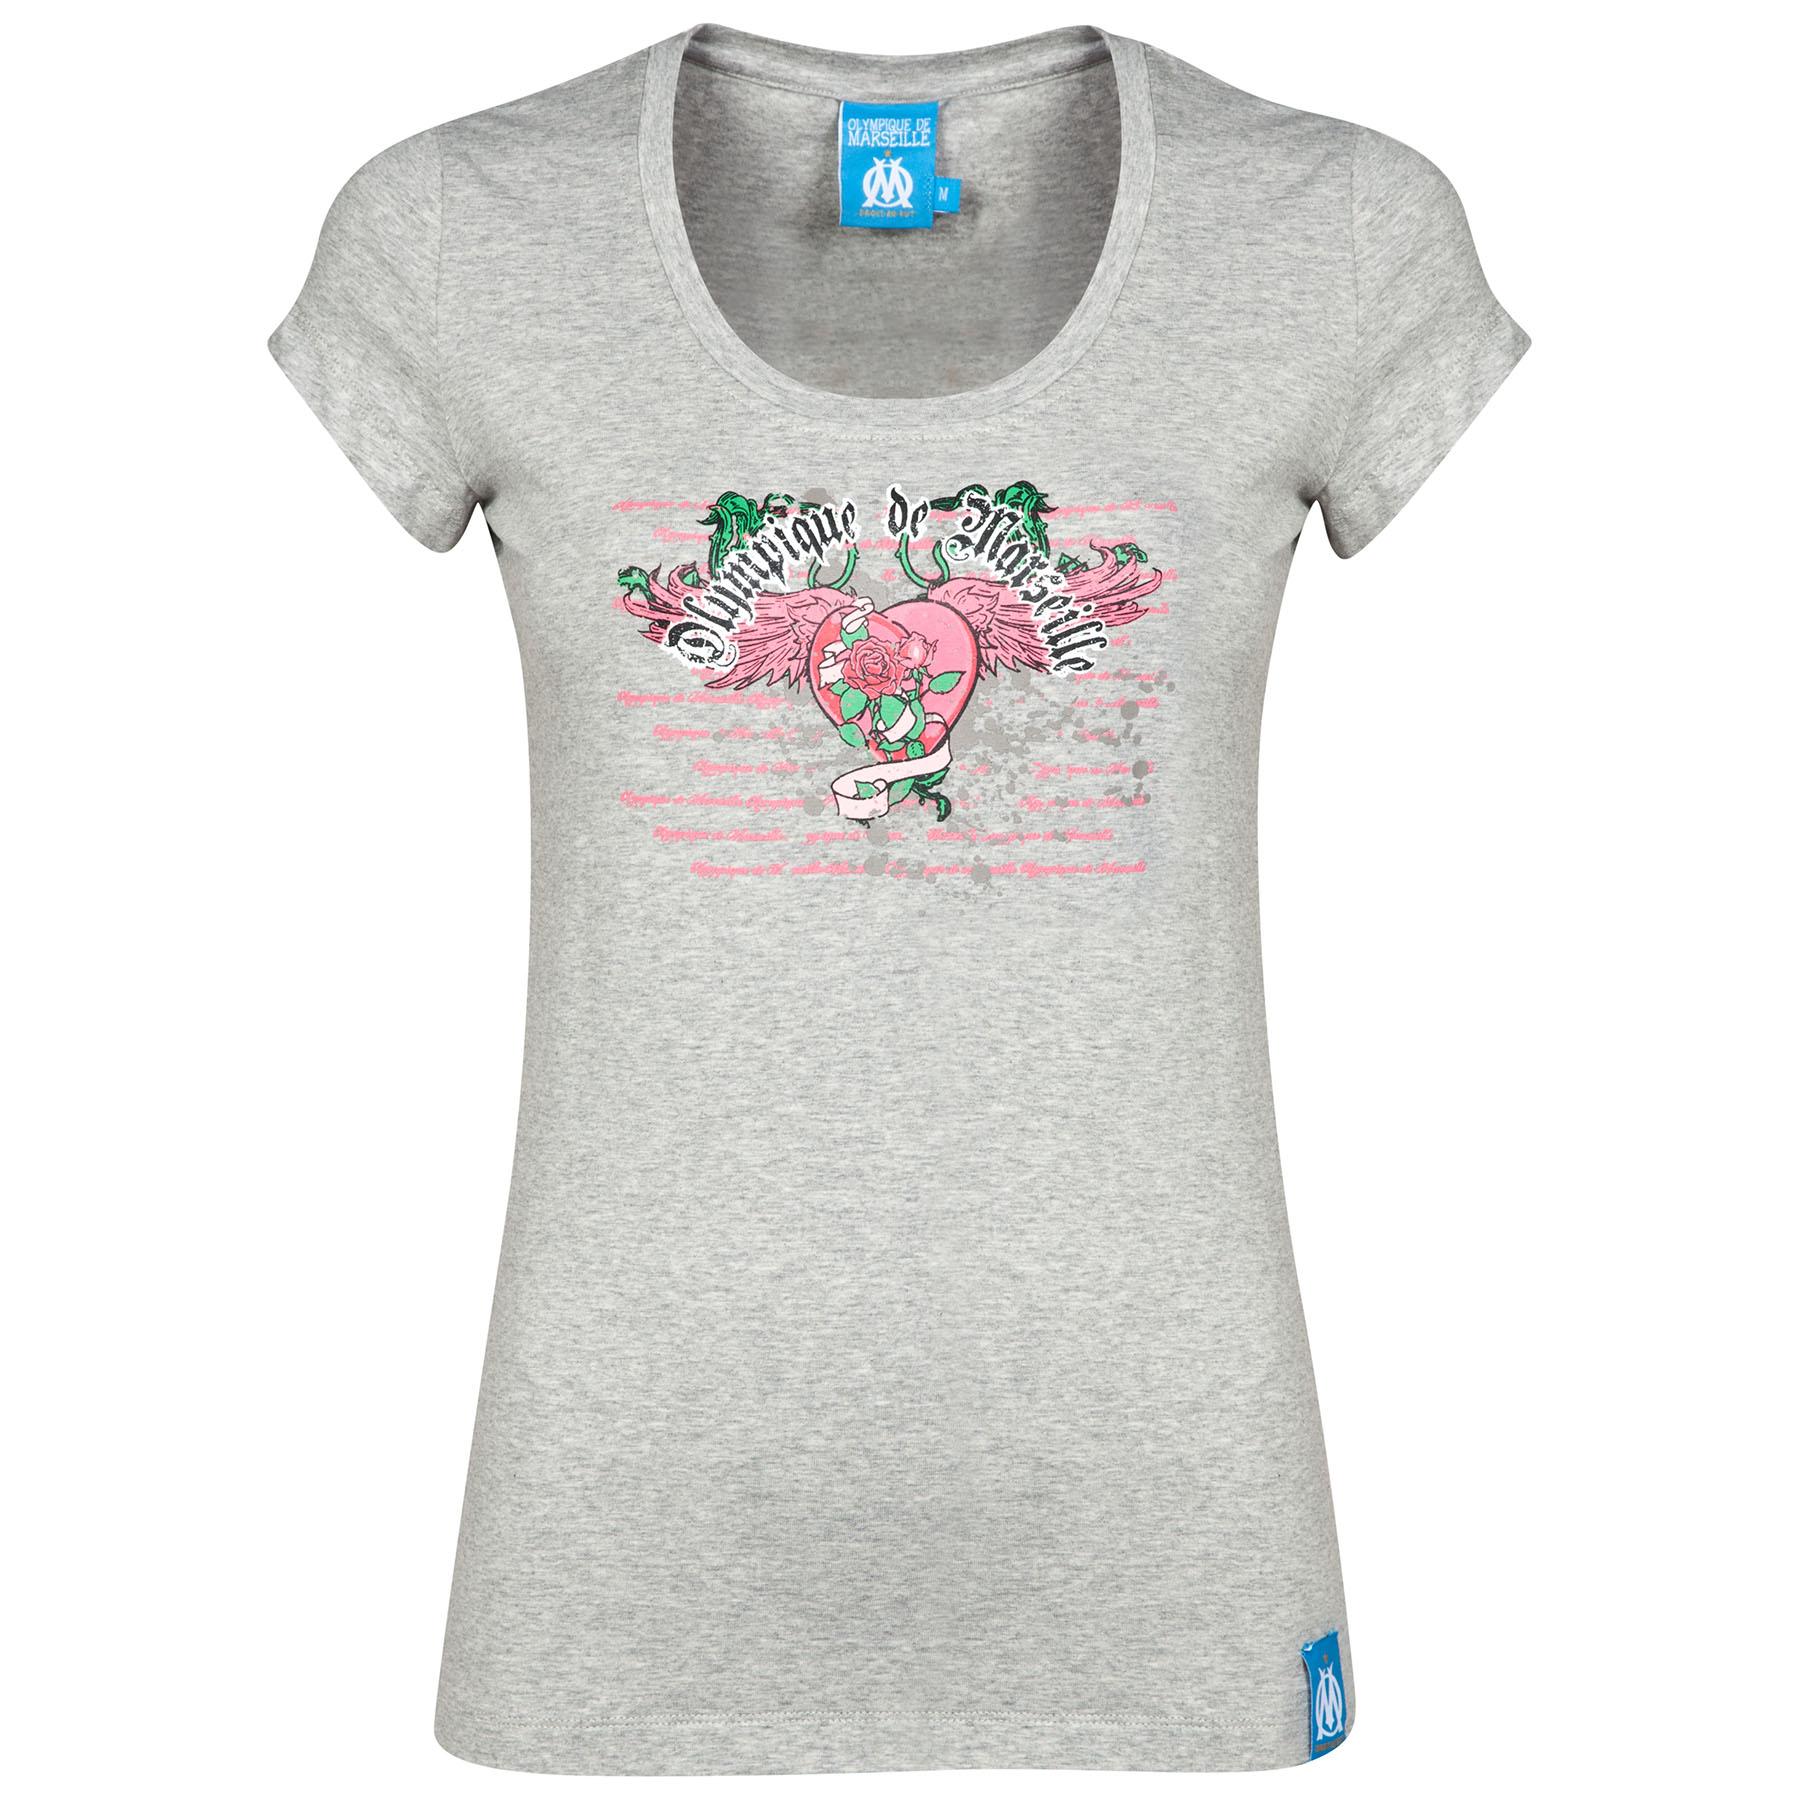 Olympique de Marseille Flower T-Shirt - Grey - Womens Grey